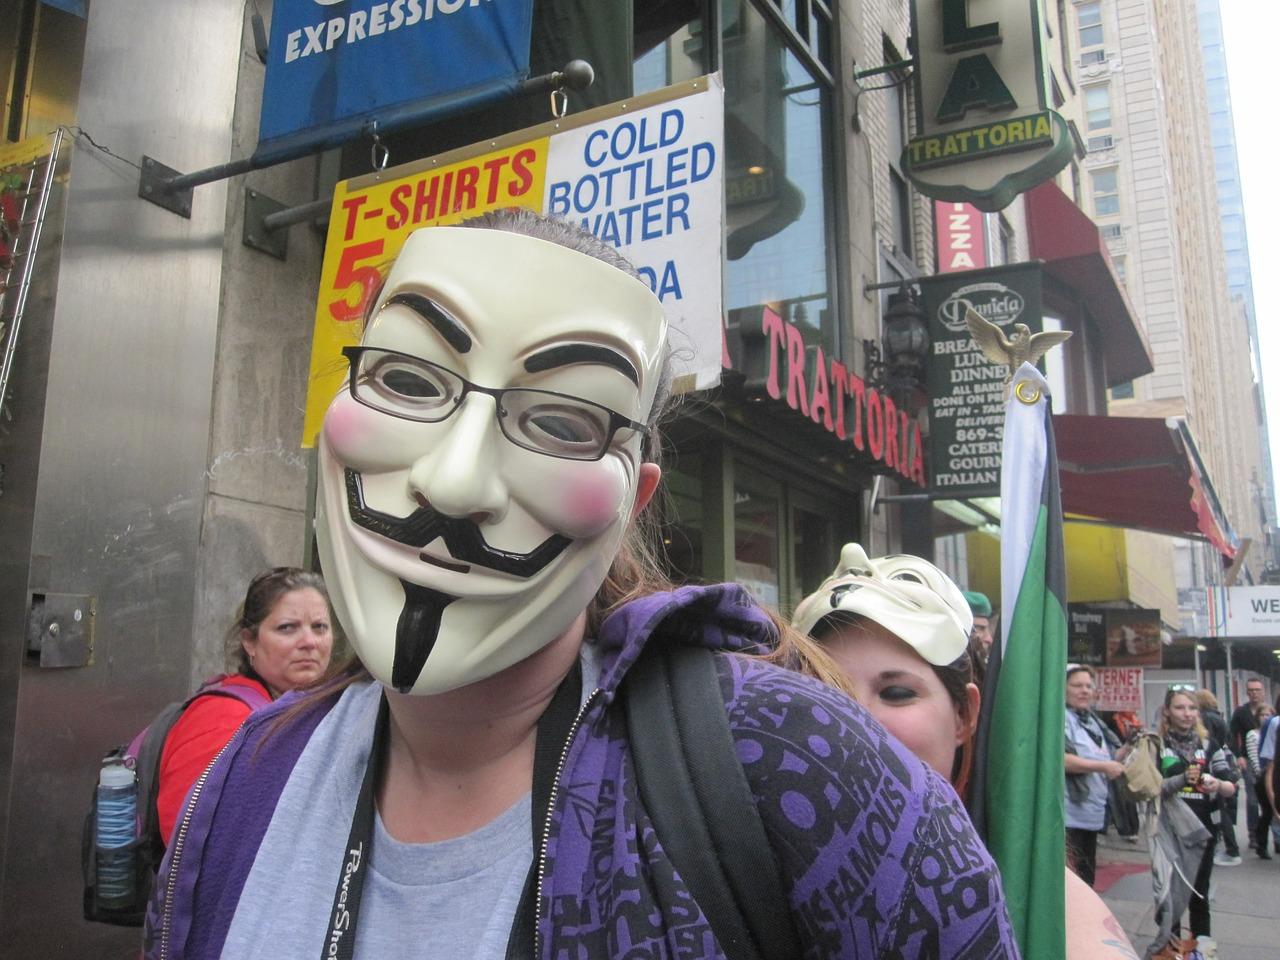 Anonymous team are threatening